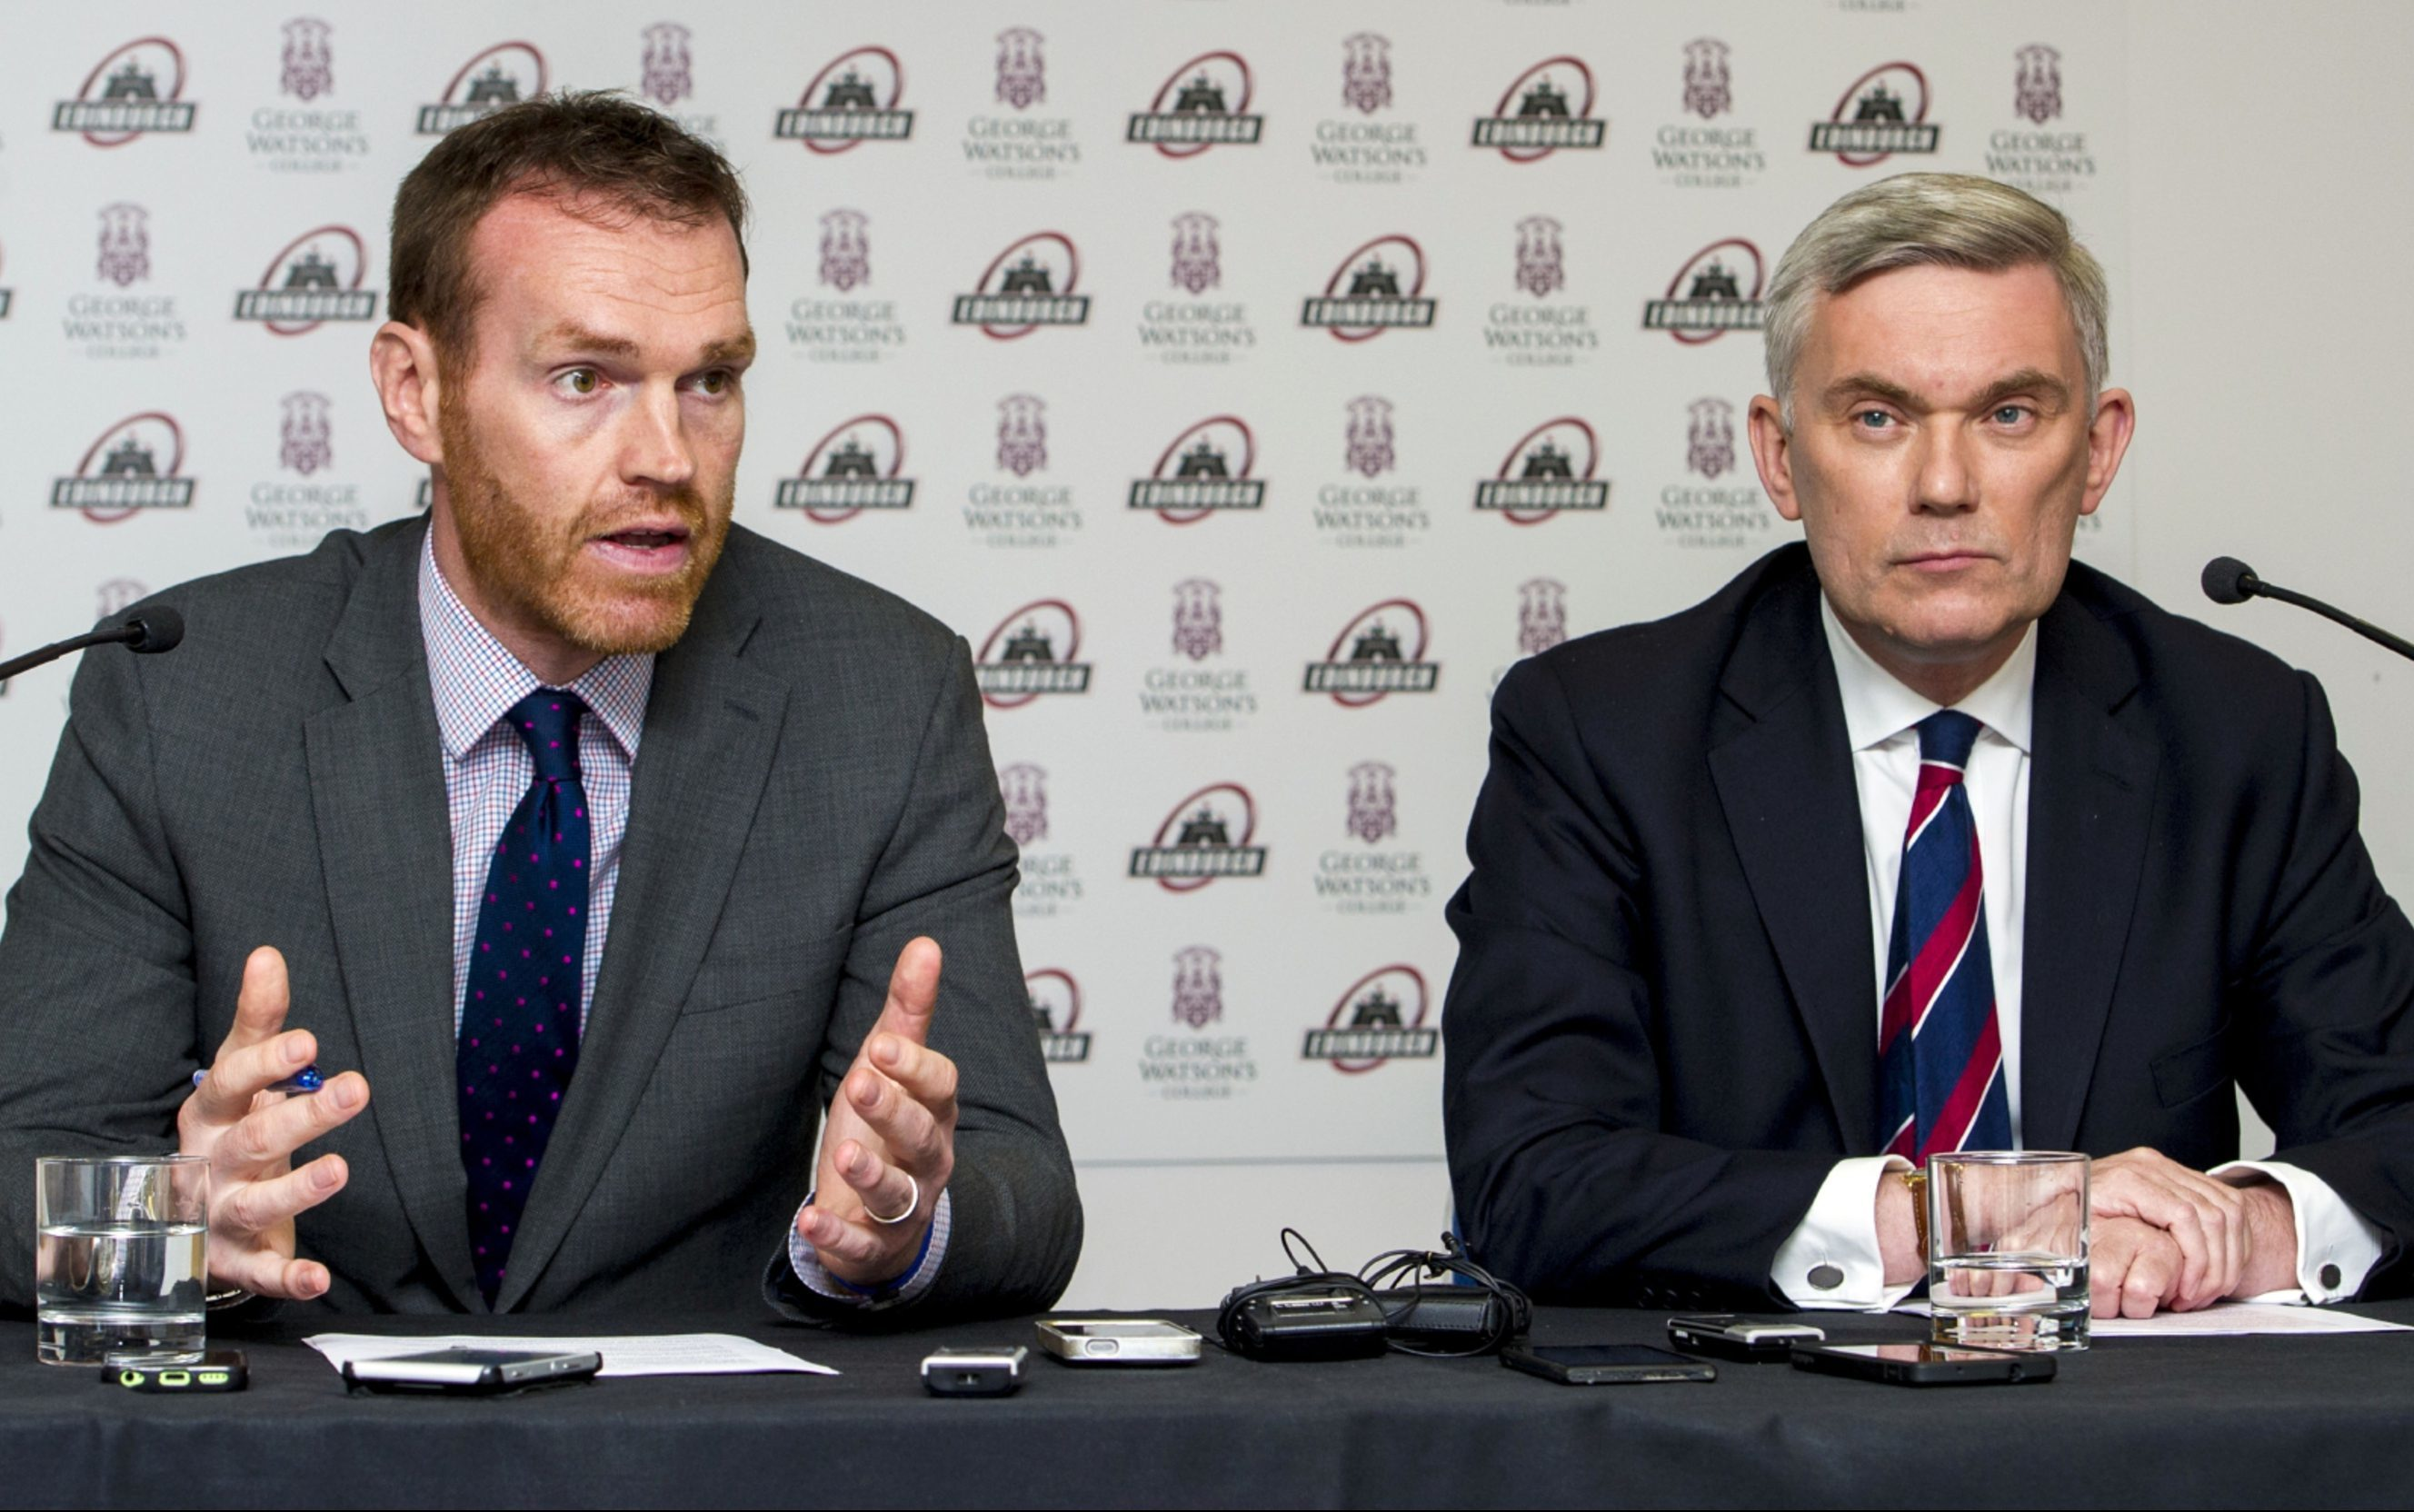 Edinburgh managing director Jonny Petrie and George Watson's College principal Melvyn Roffe.